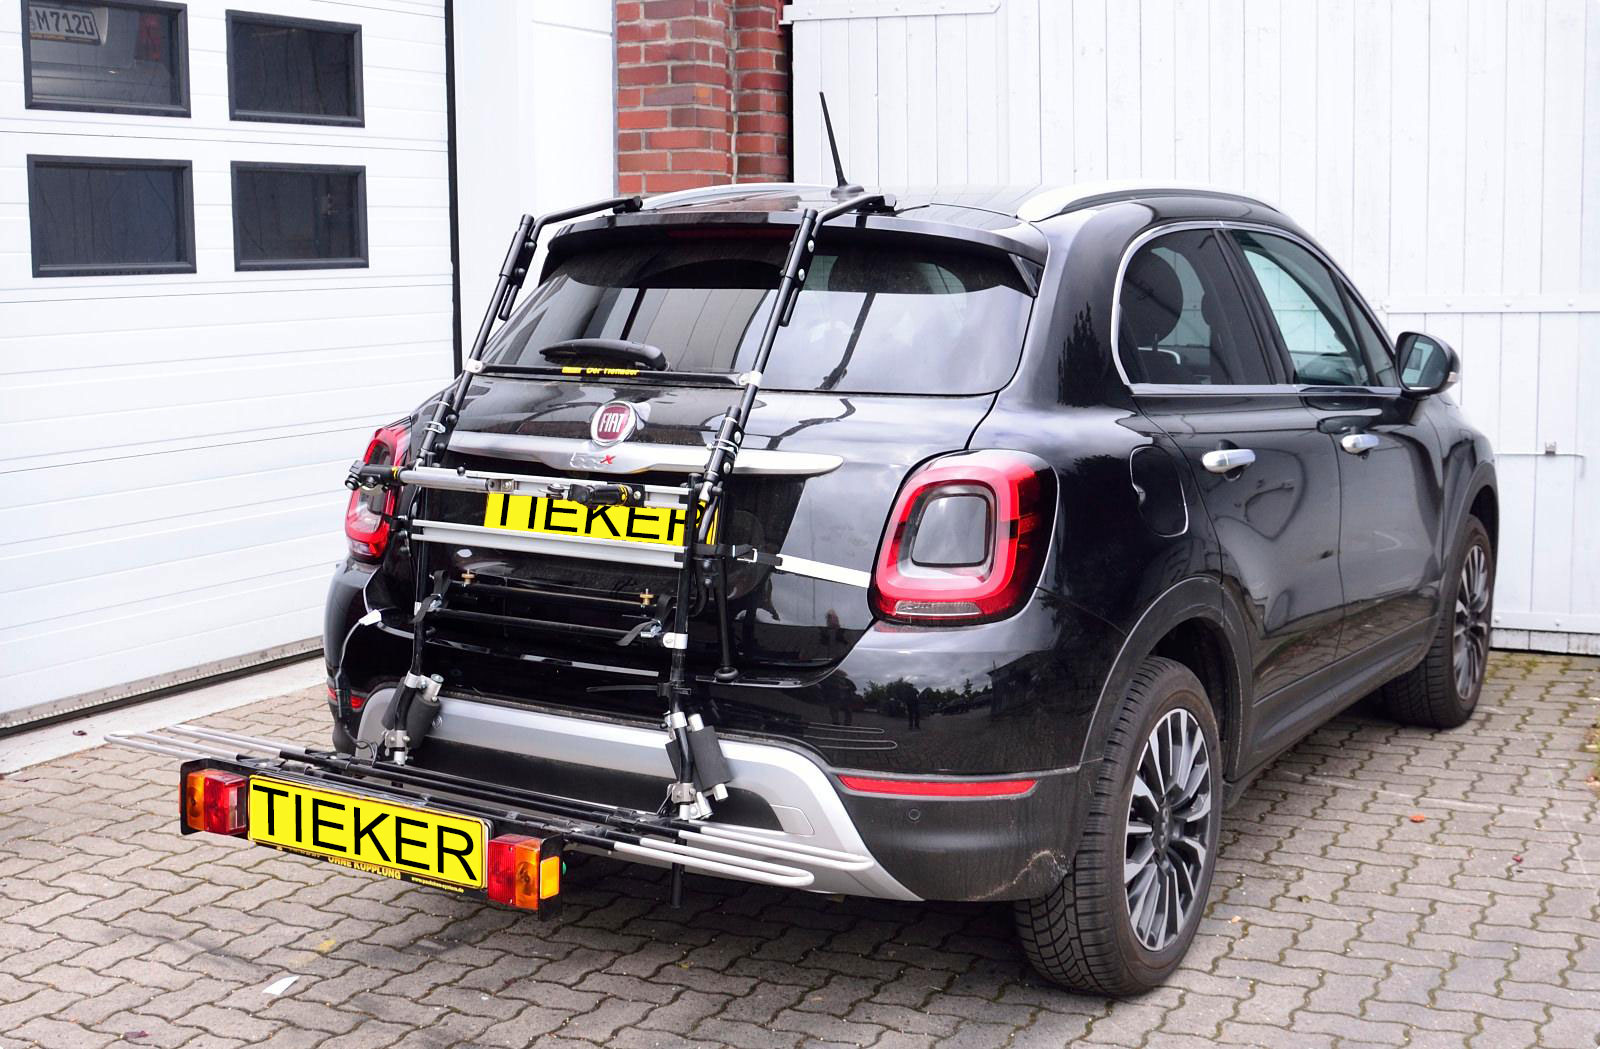 Fahrradträger Fiat 500 X - Heckfahrradträger Montage am Kofferraum ohne Anhängerkupplung